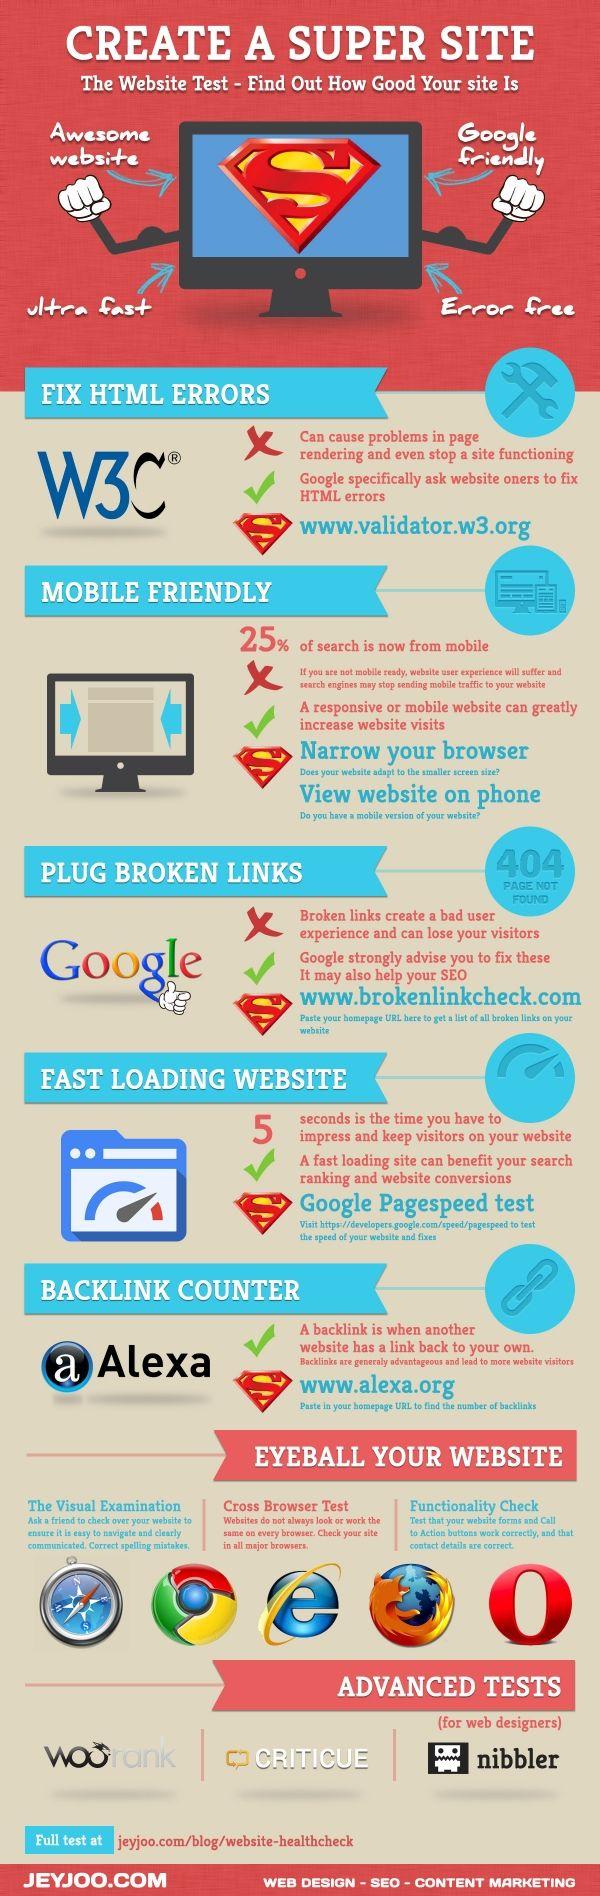 Create a supersite #google #web #seo #w3c www.rubendelaosa.com